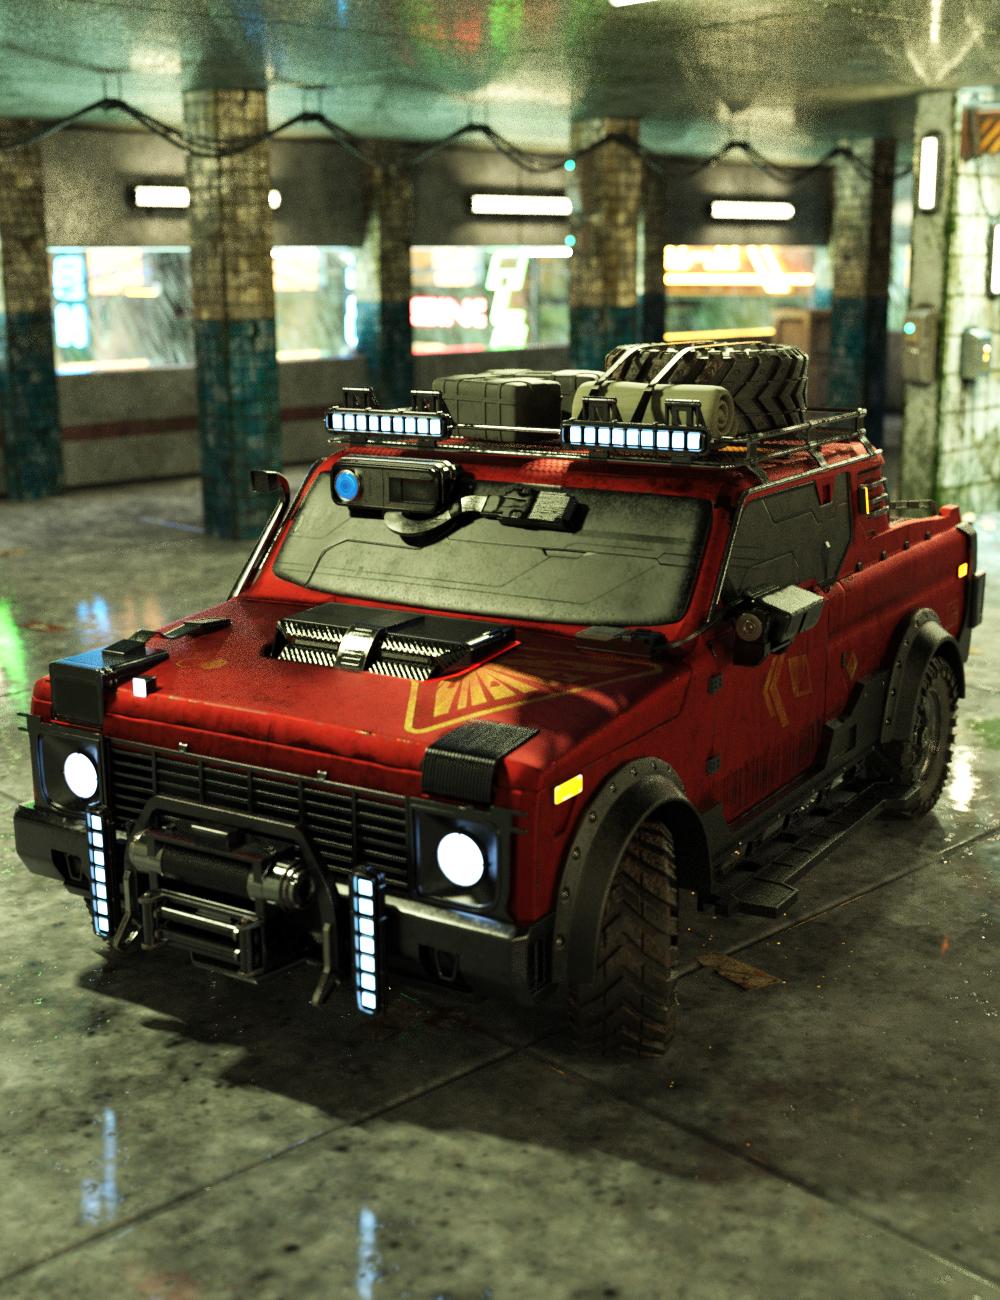 Cyberpunk Pickup Truck by: Charlie, 3D Models by Daz 3D